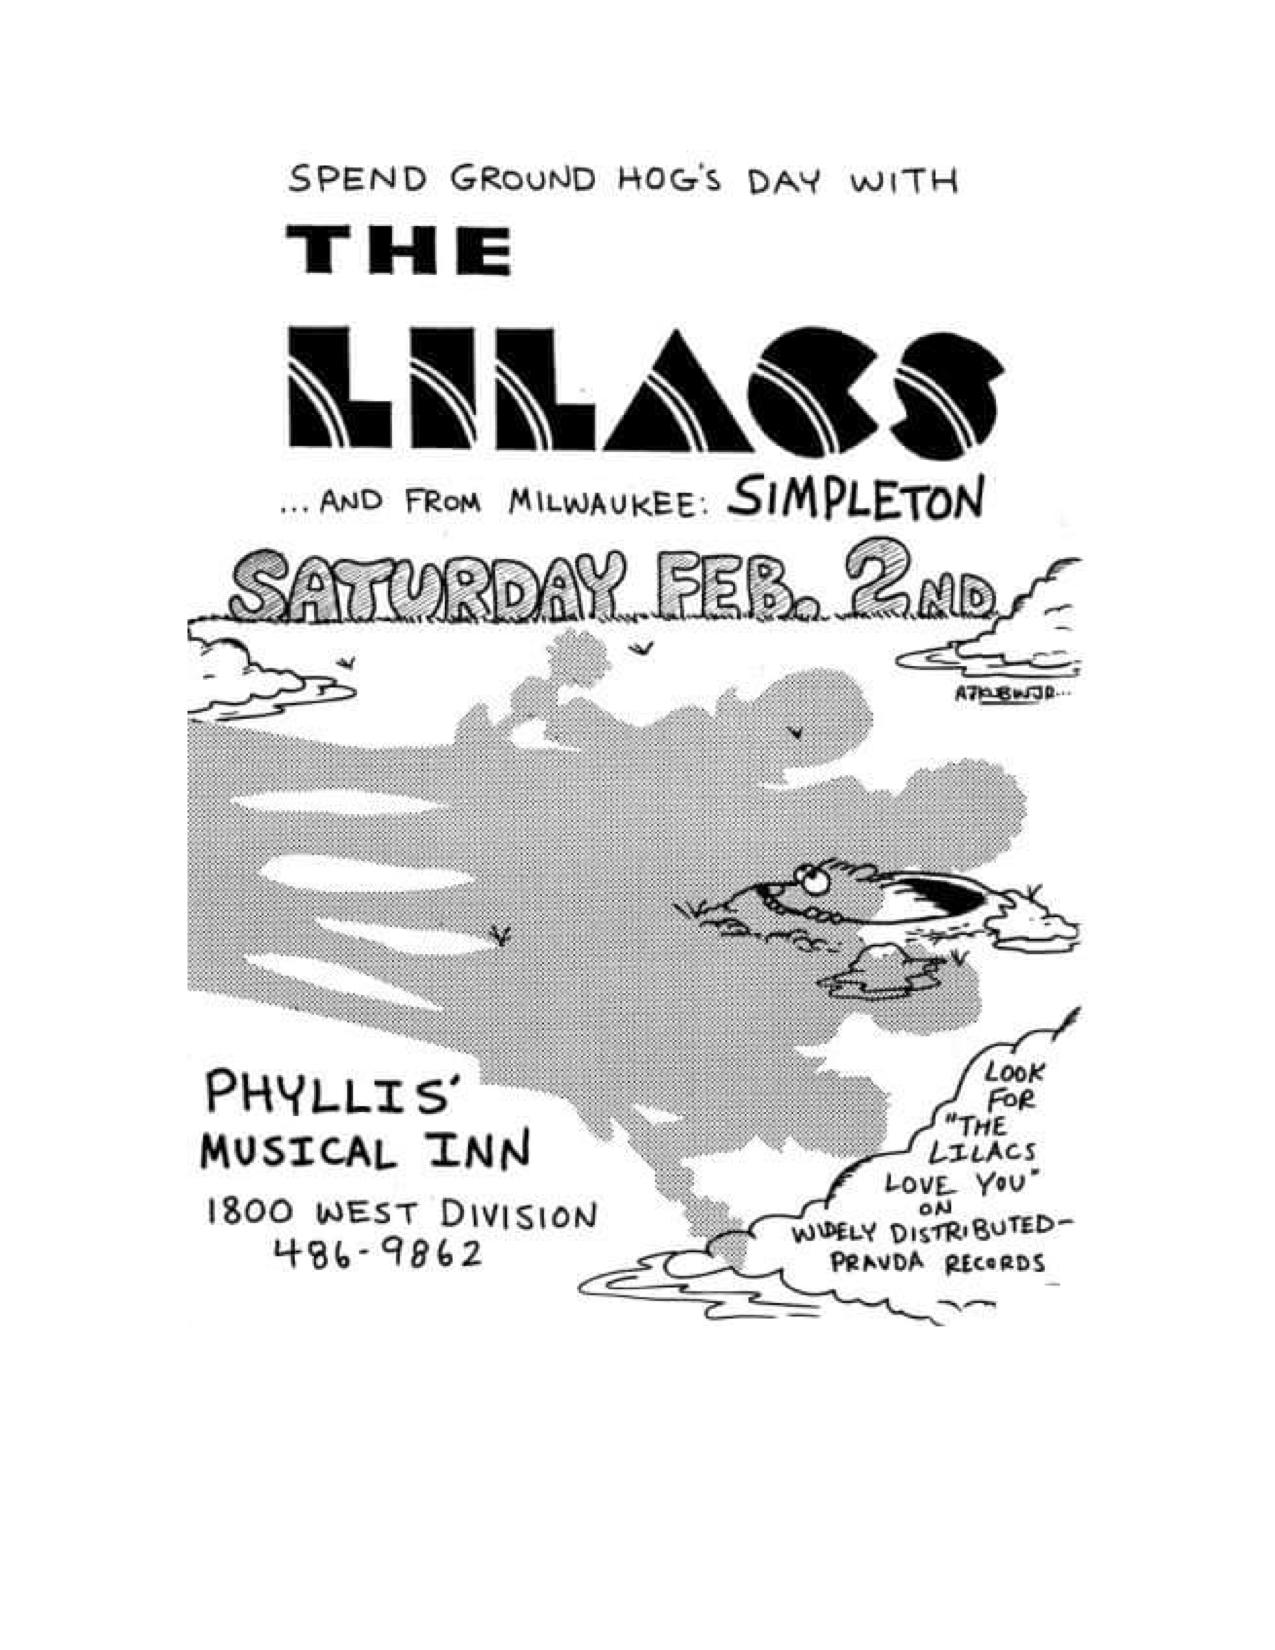 The Lilacs Poster 3 (Simpleton).jpg